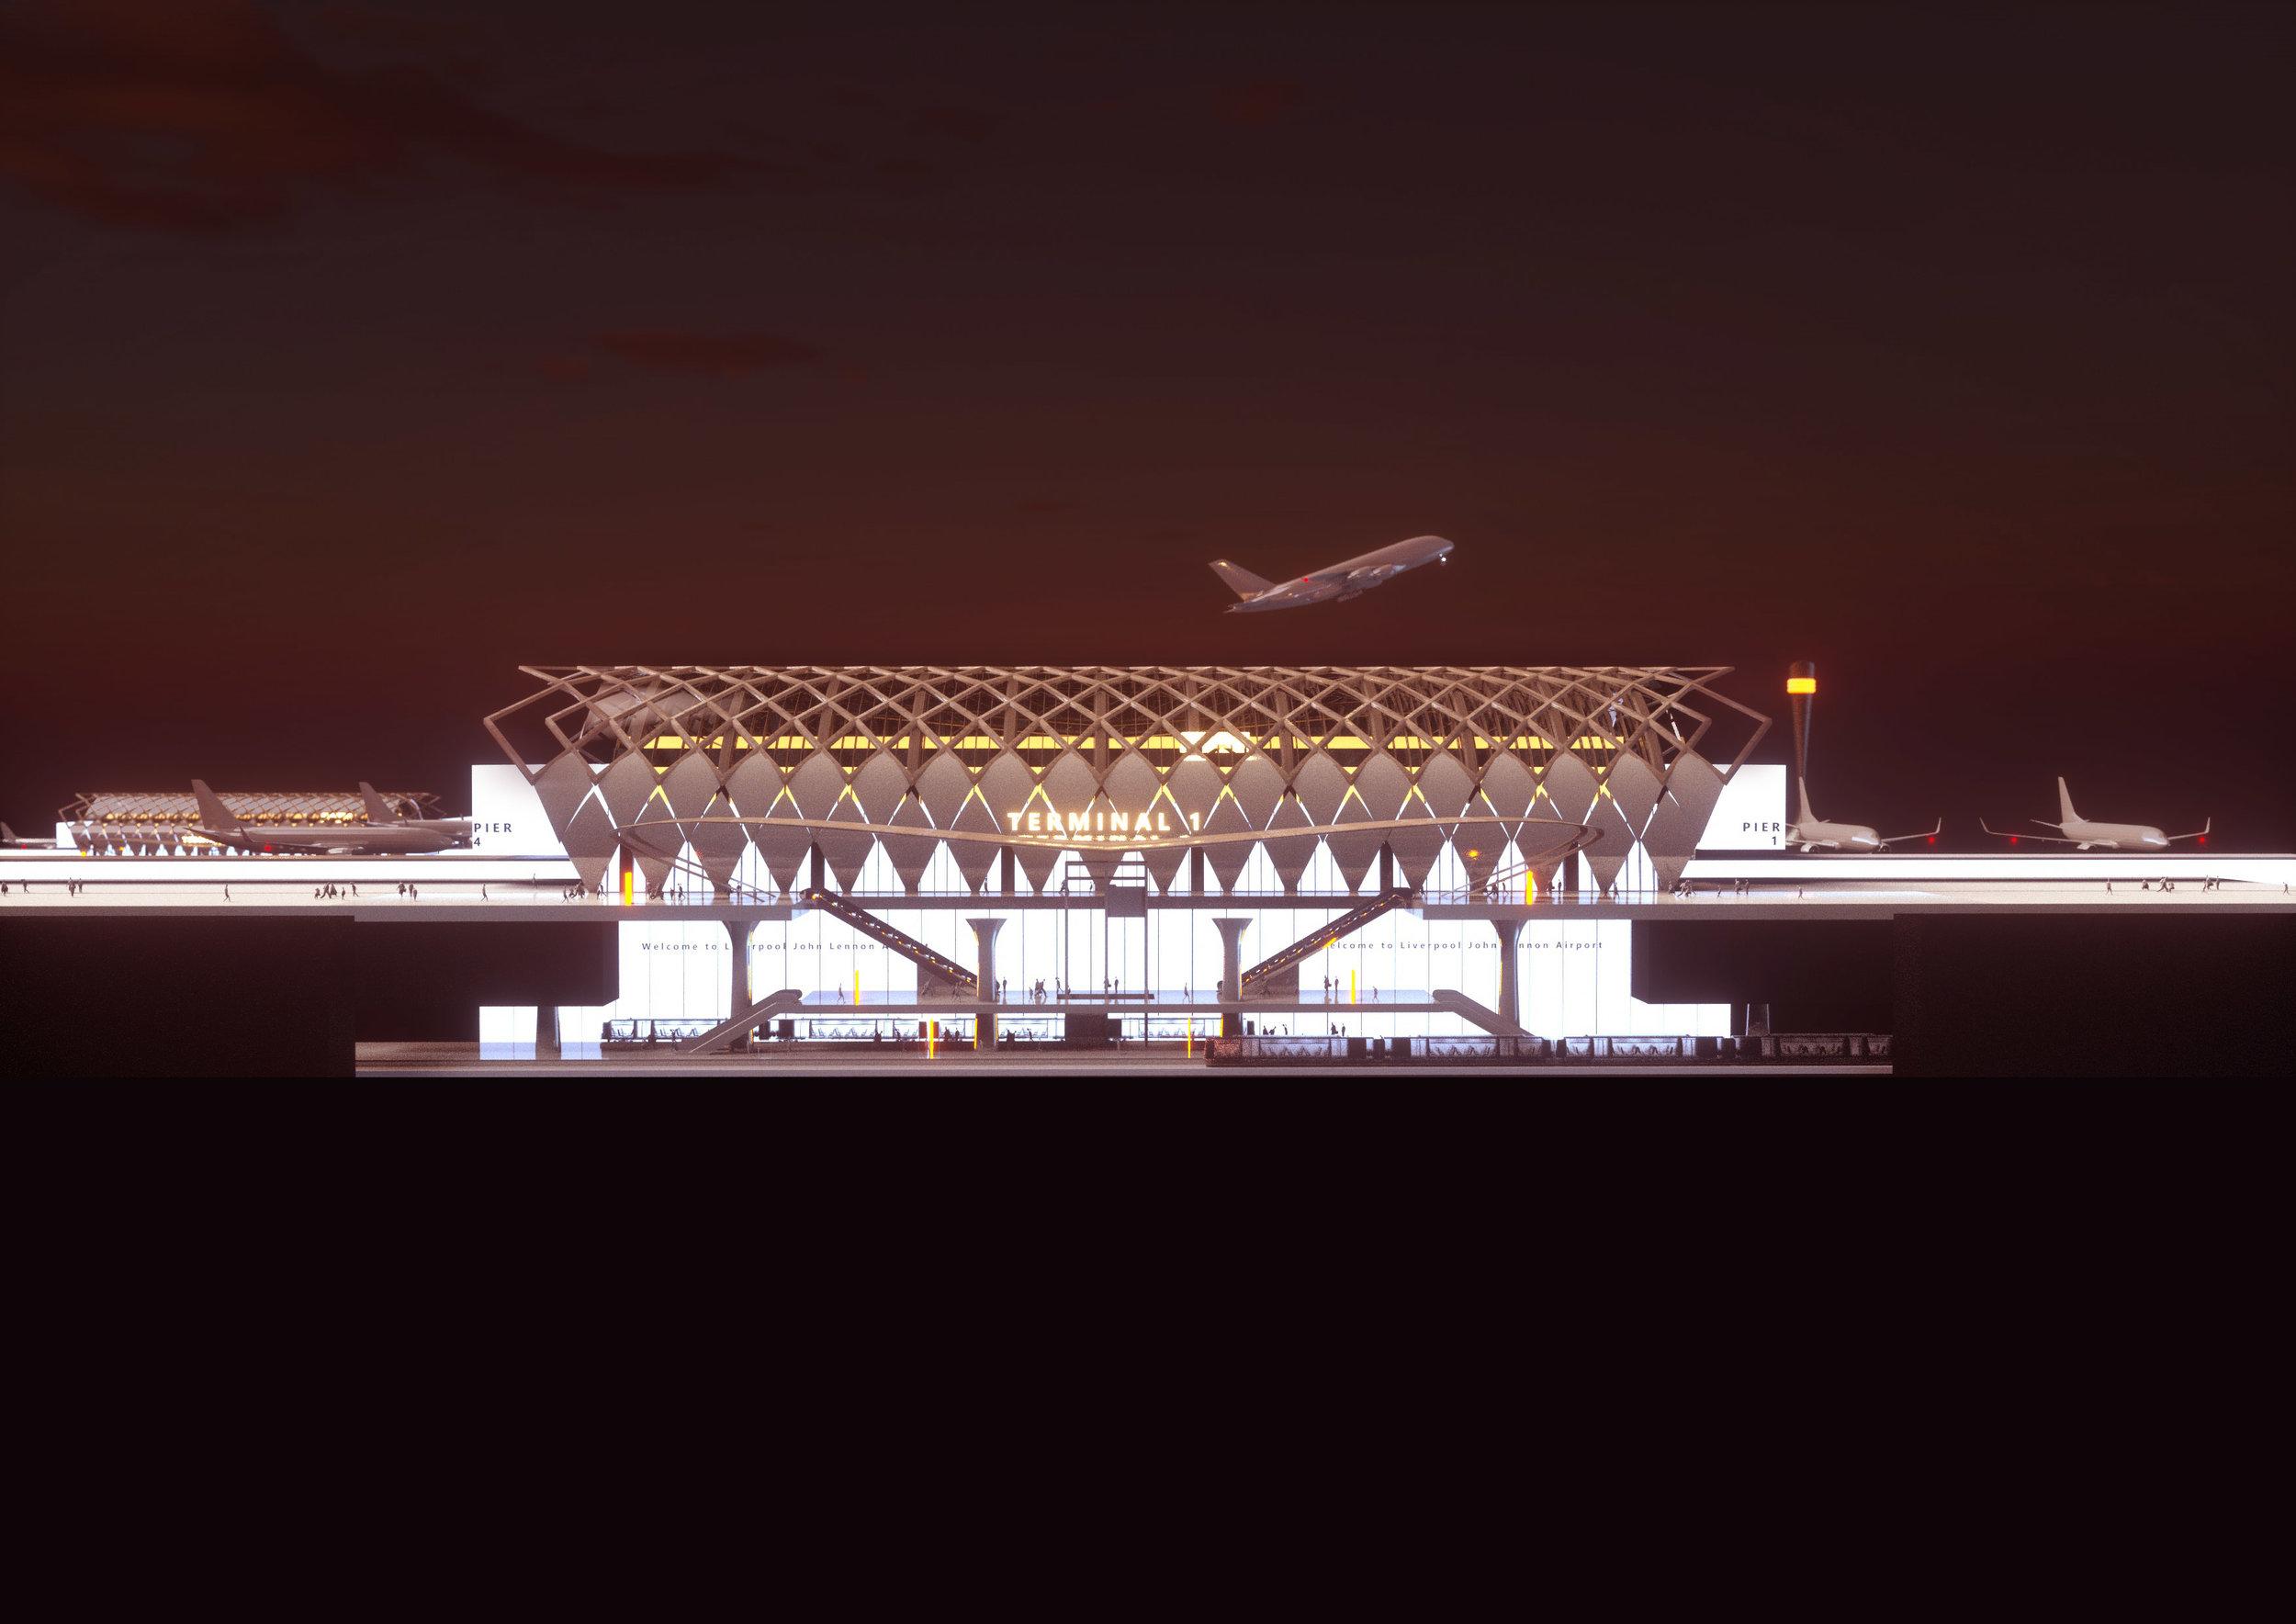 New Liverpool Airport CGI Fantasist